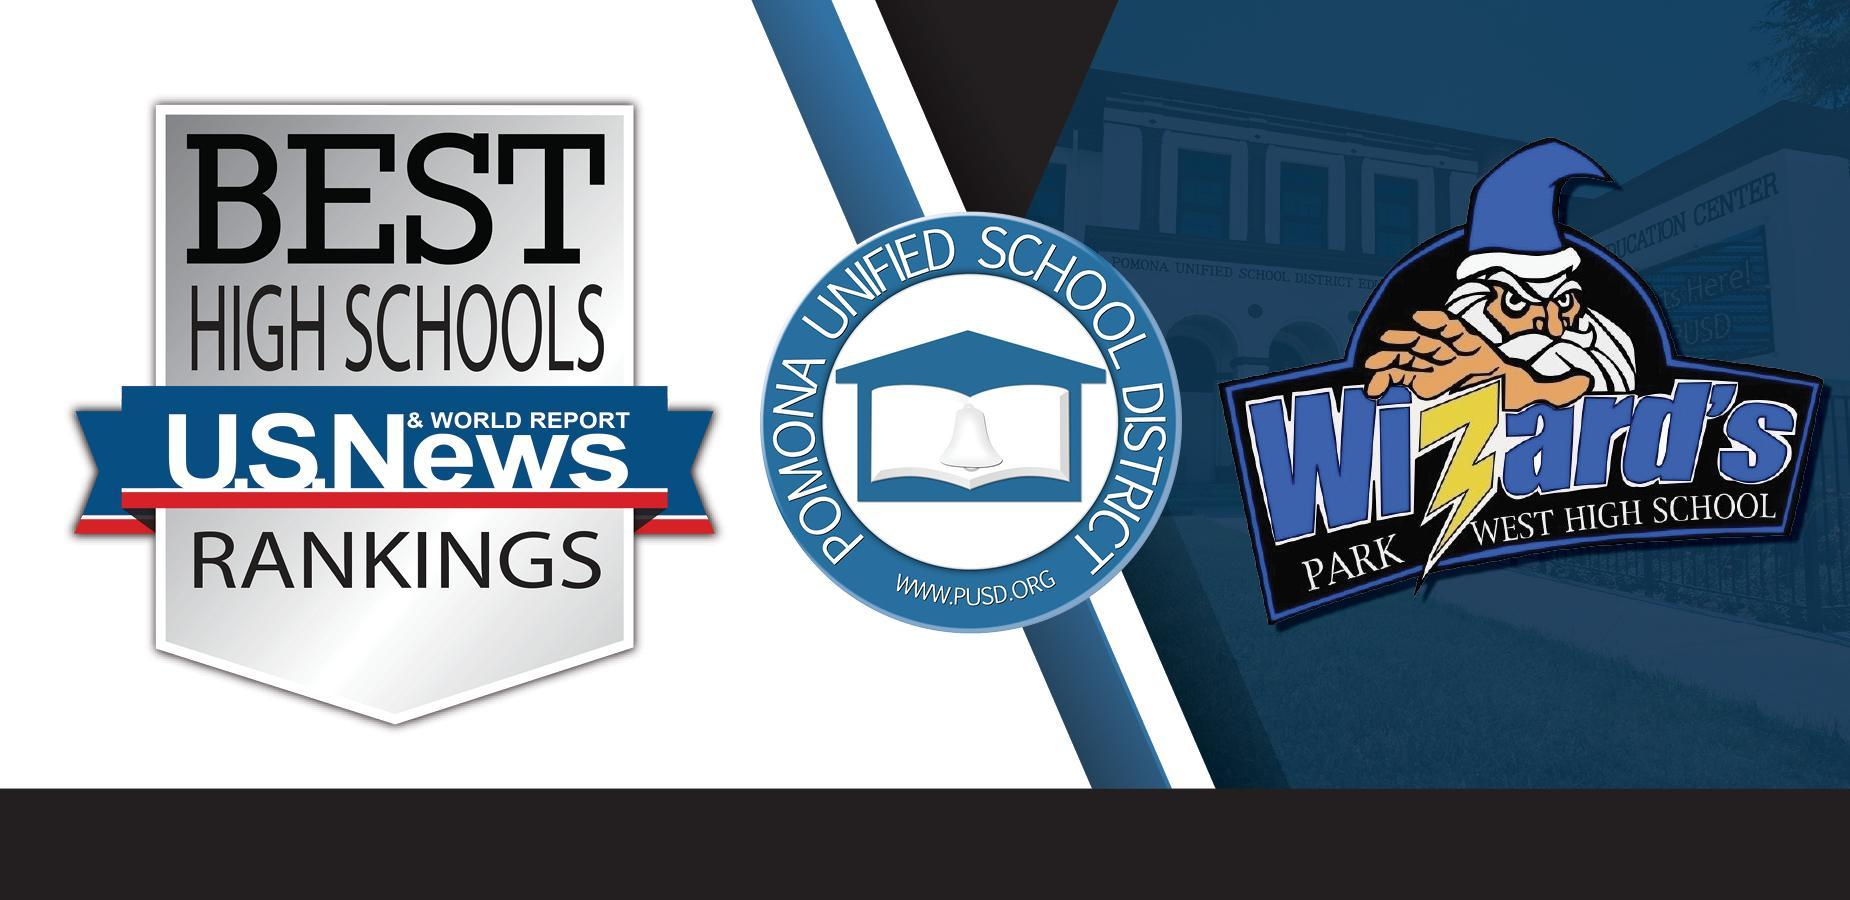 U.S. News & World Report - Best High Schools Award